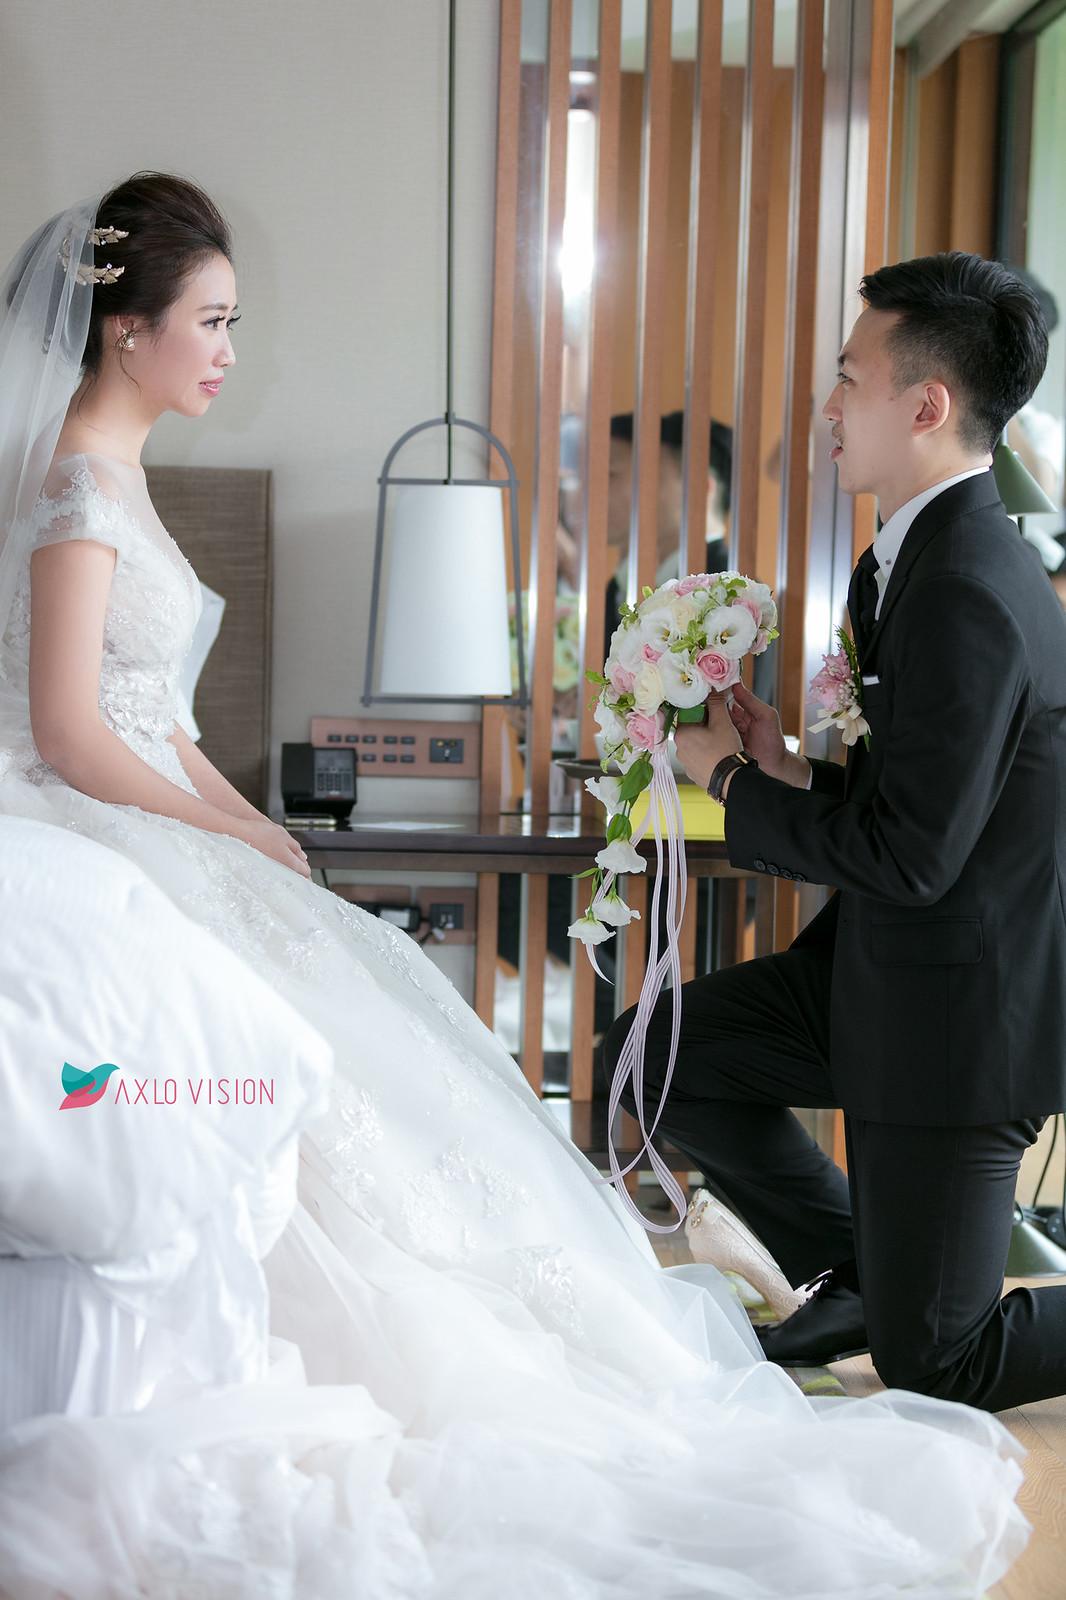 20170916 WeddingDay_077